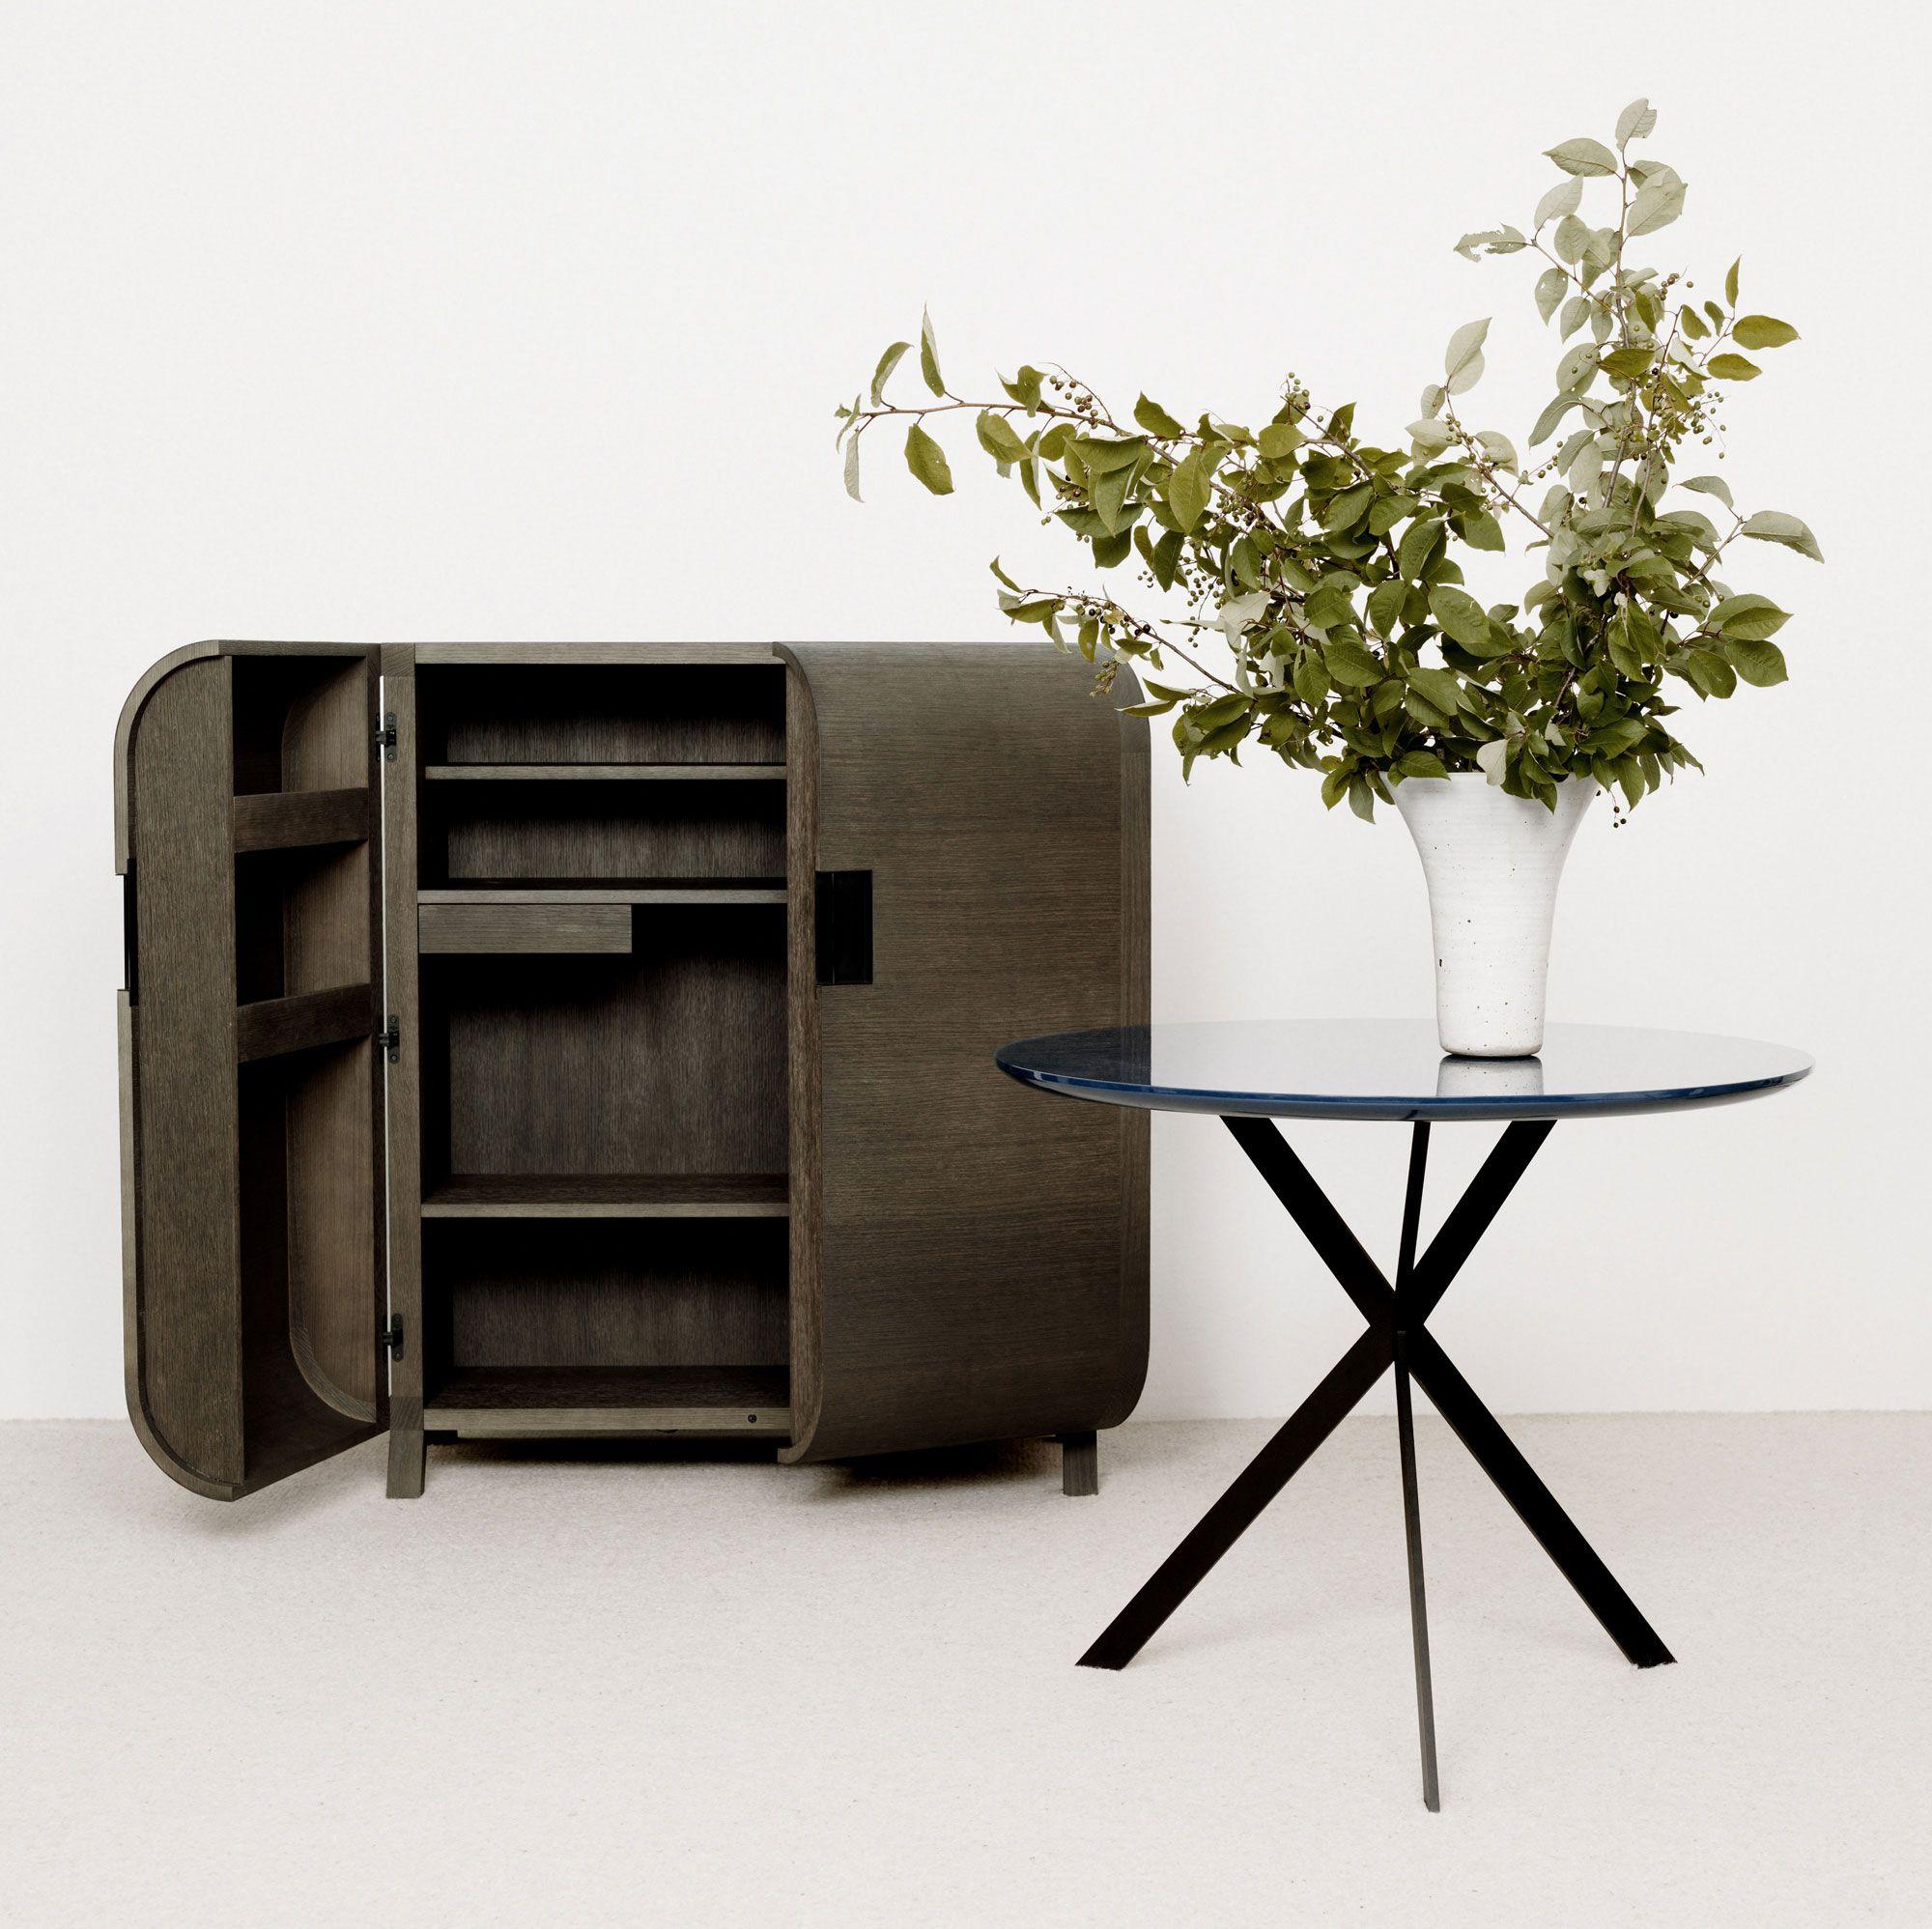 0e9c71ca95aff48410386c1aa19c47e6 Incroyable De Table Basse Le Corbusier Concept